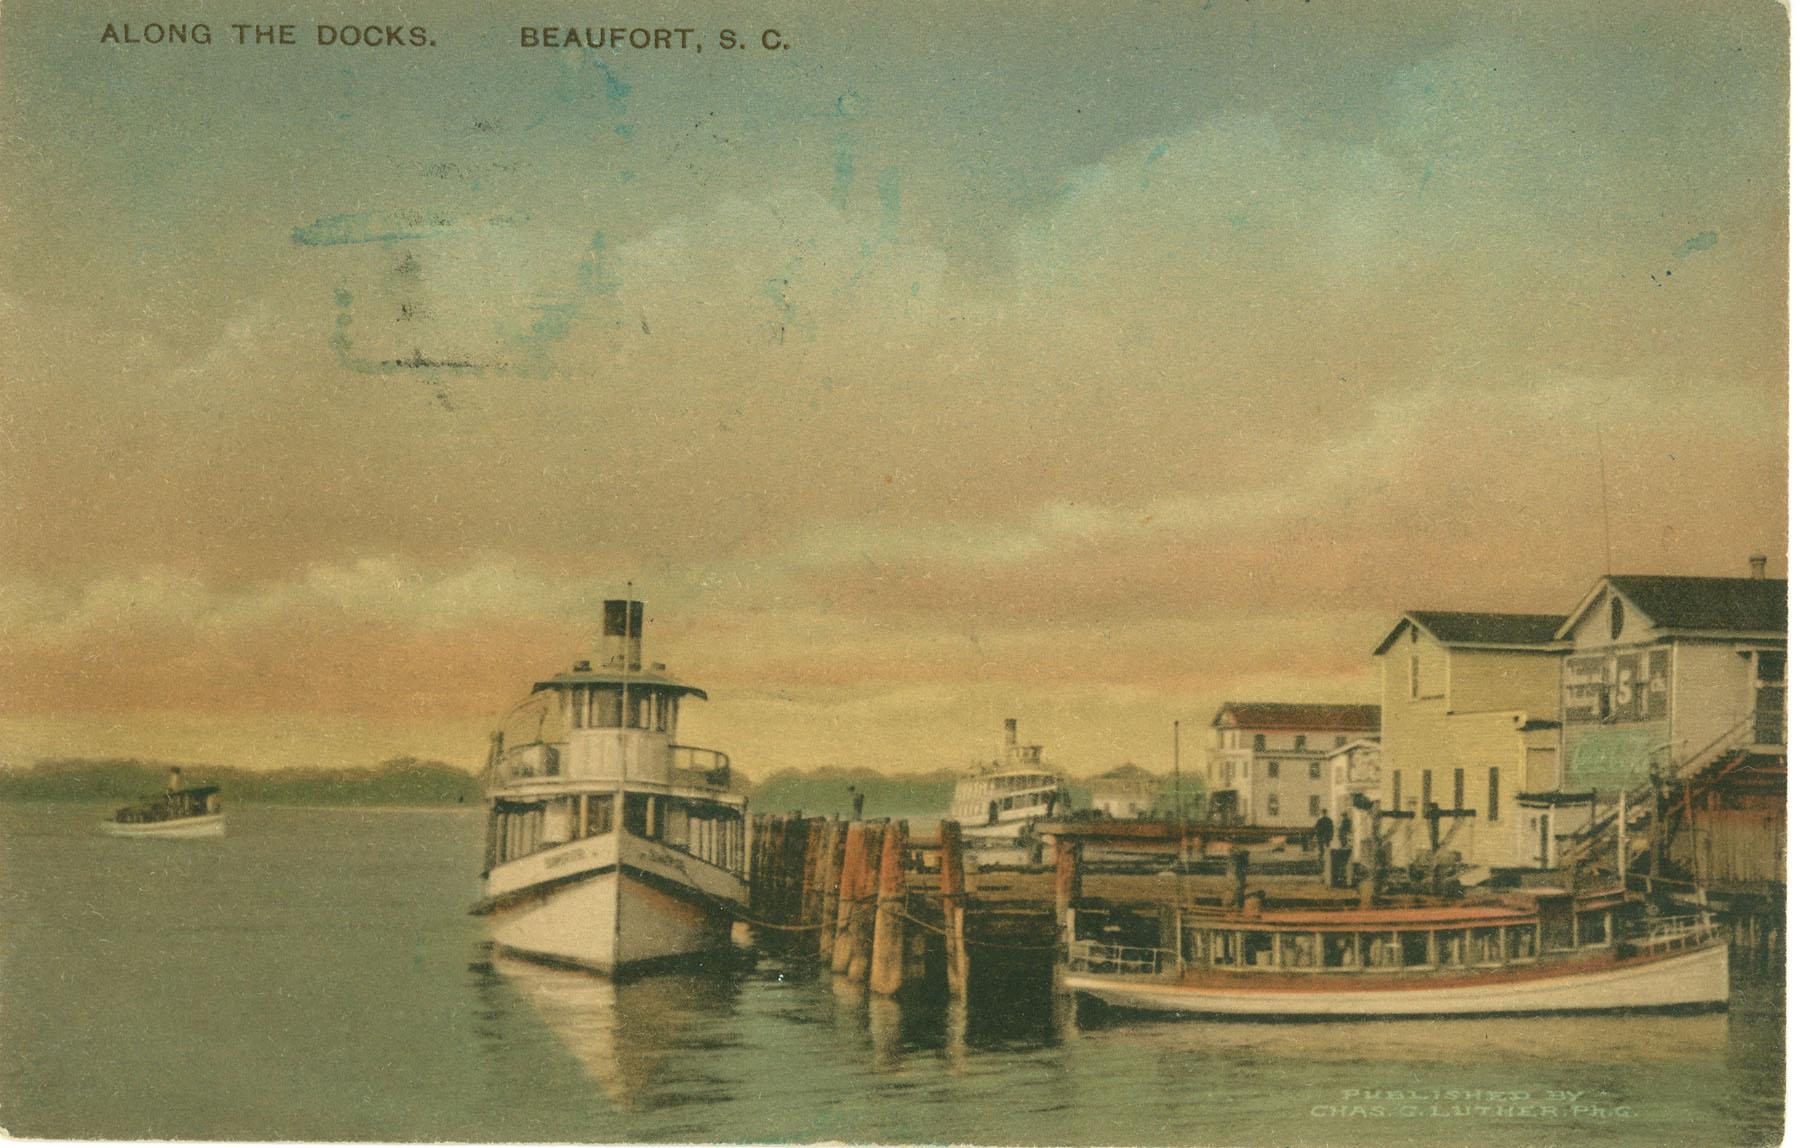 Boats by the Docks in Beaufort